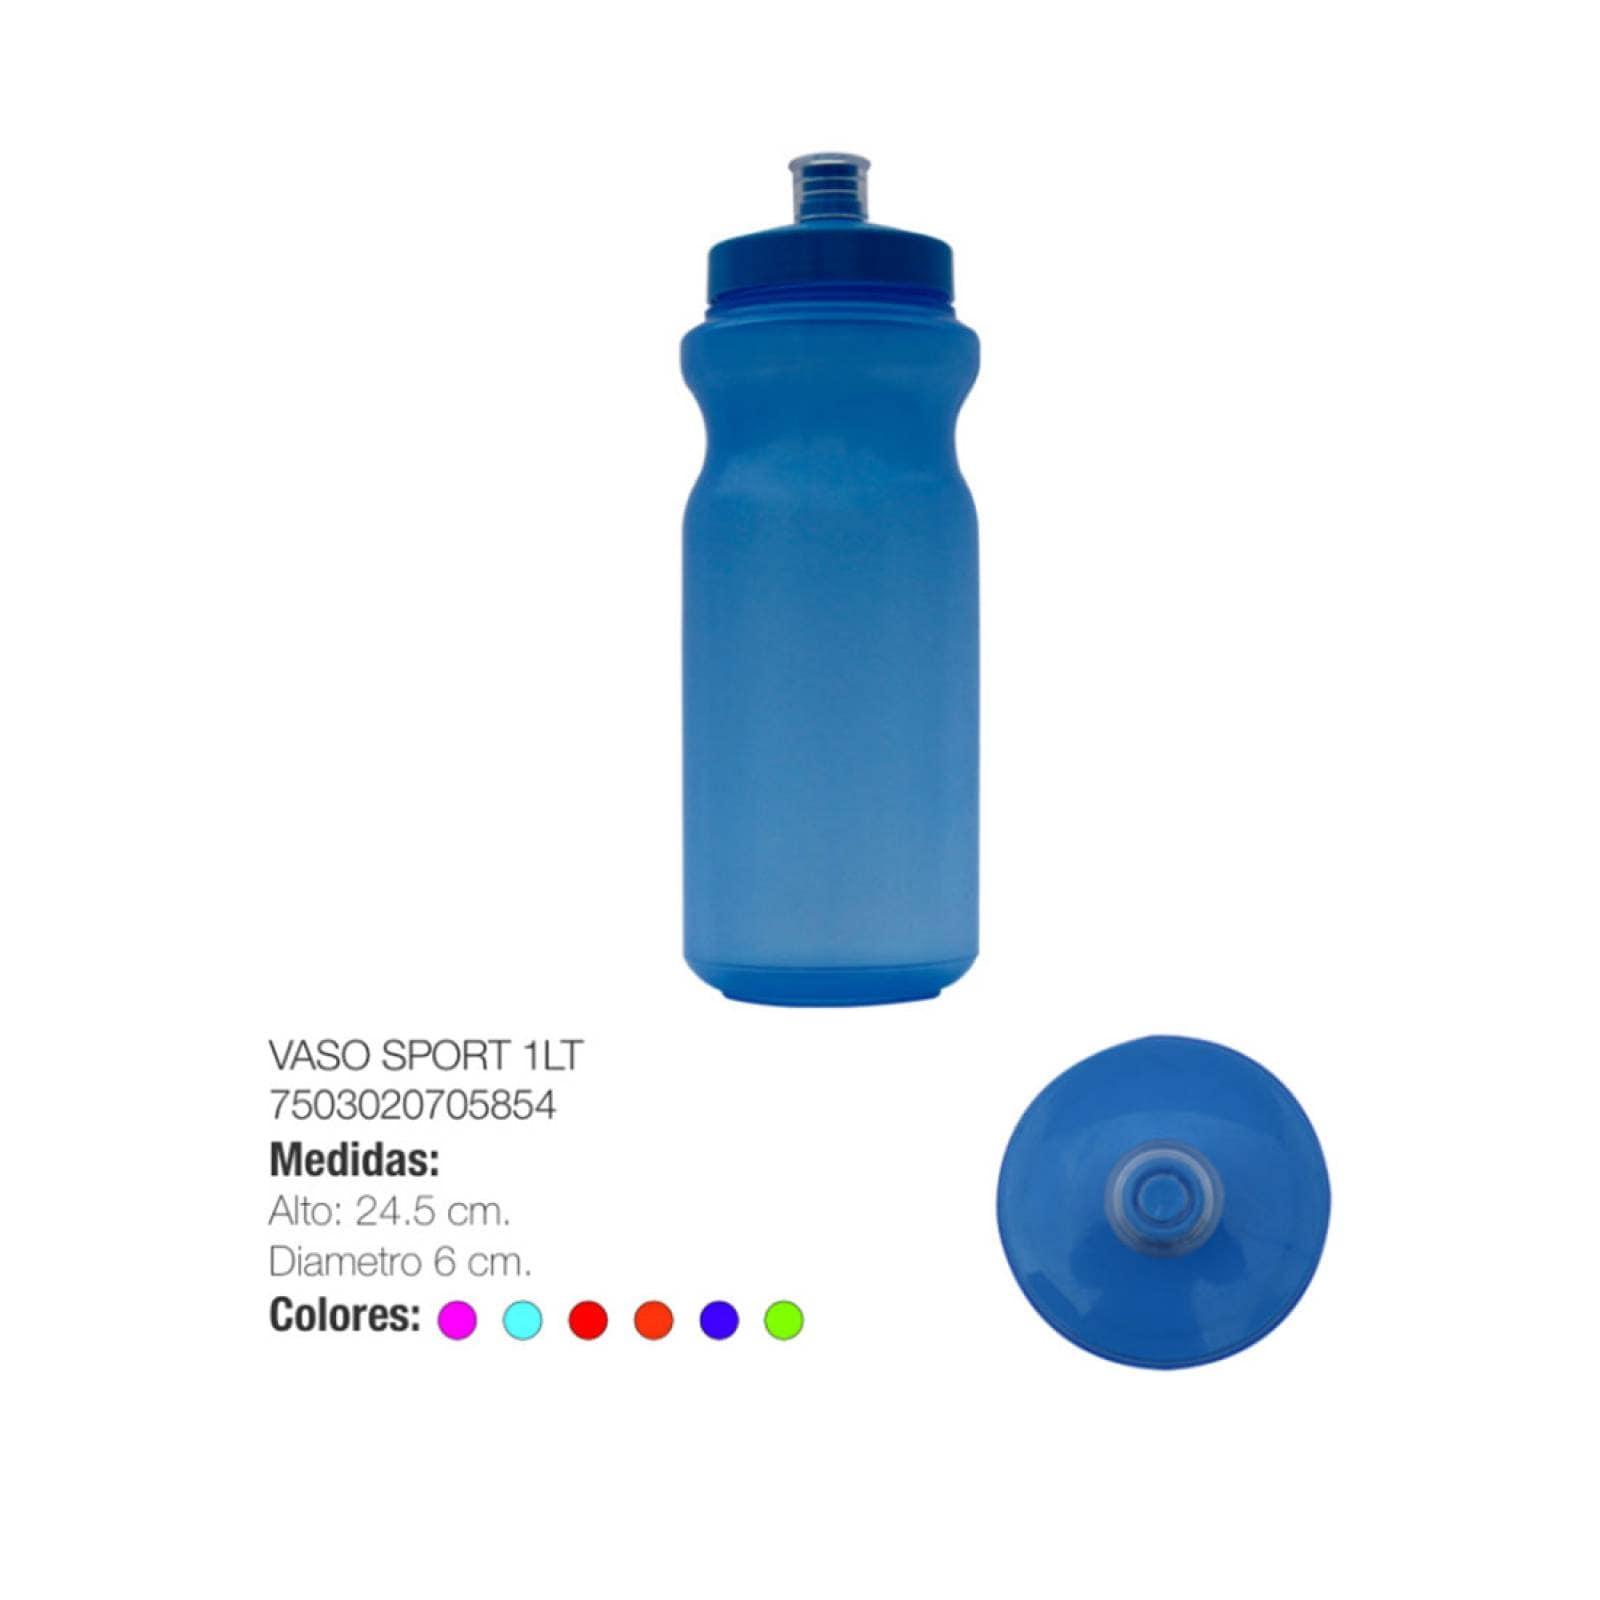 Vaso Cilindro Sport Plástico 1LT Hogar Torosqui Assorted